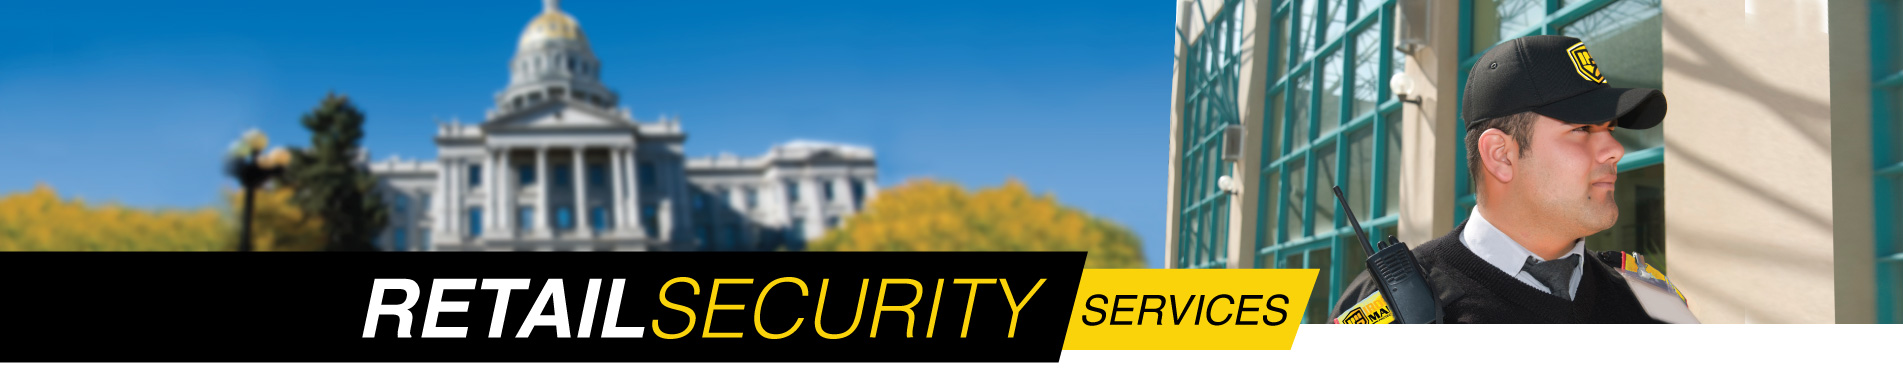 Houston area retail security services